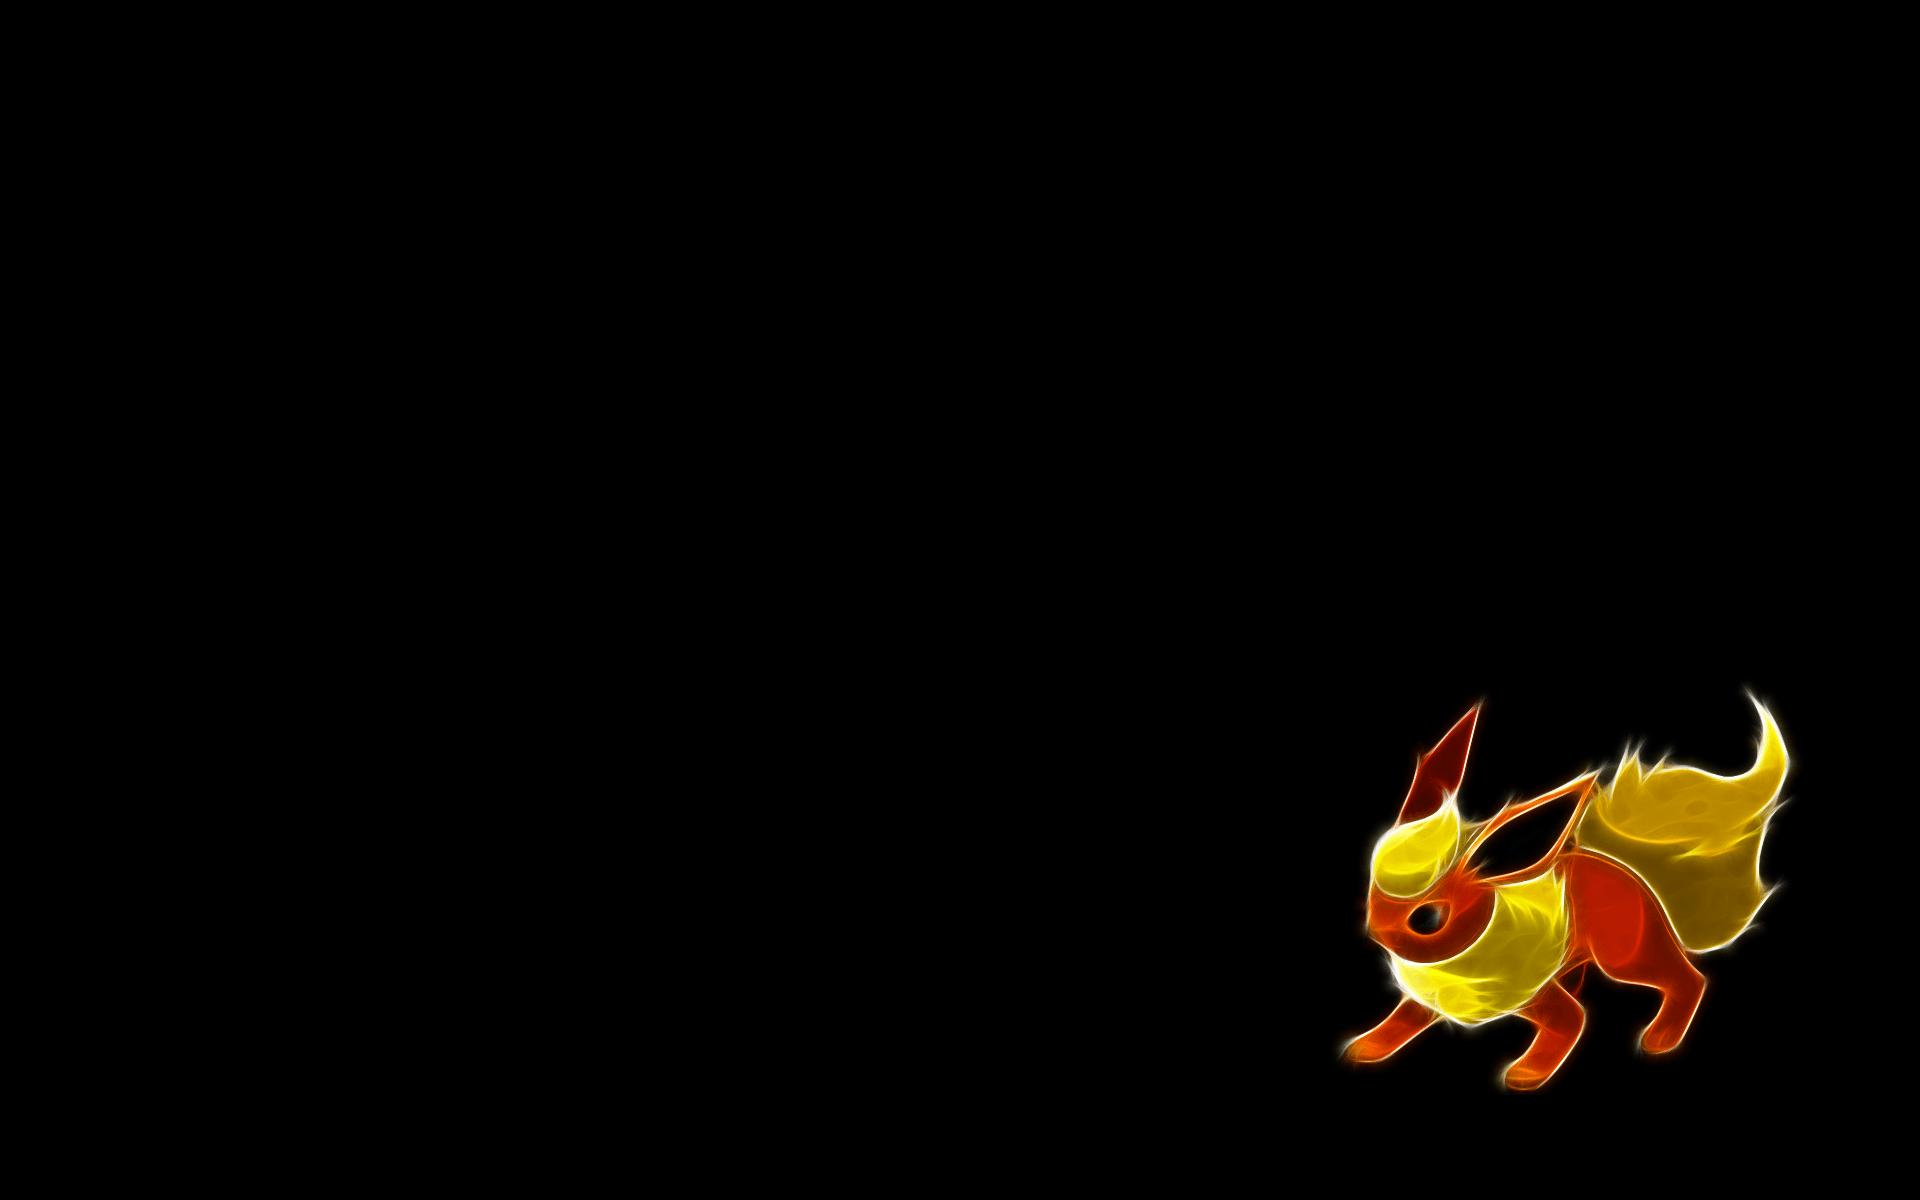 Pokemon Black Backgrounds 1920x1200